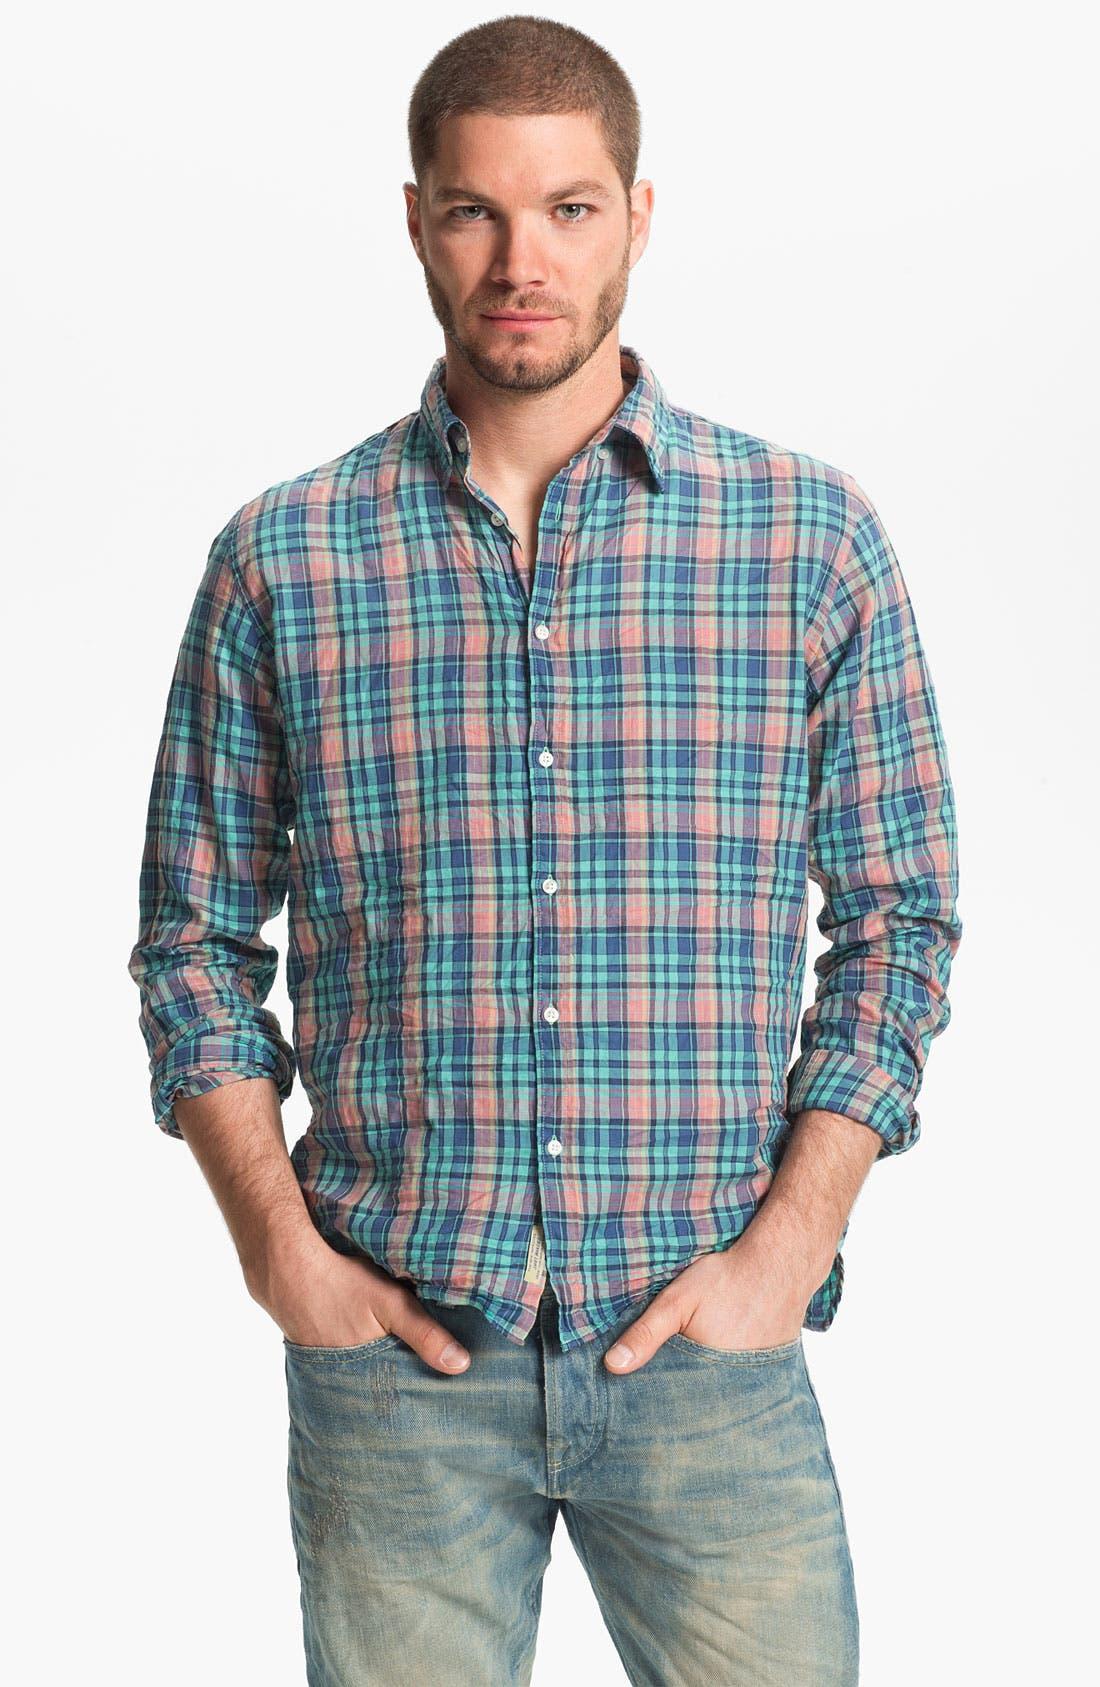 Alternate Image 1 Selected - Scotch & Soda Plaid Woven Shirt